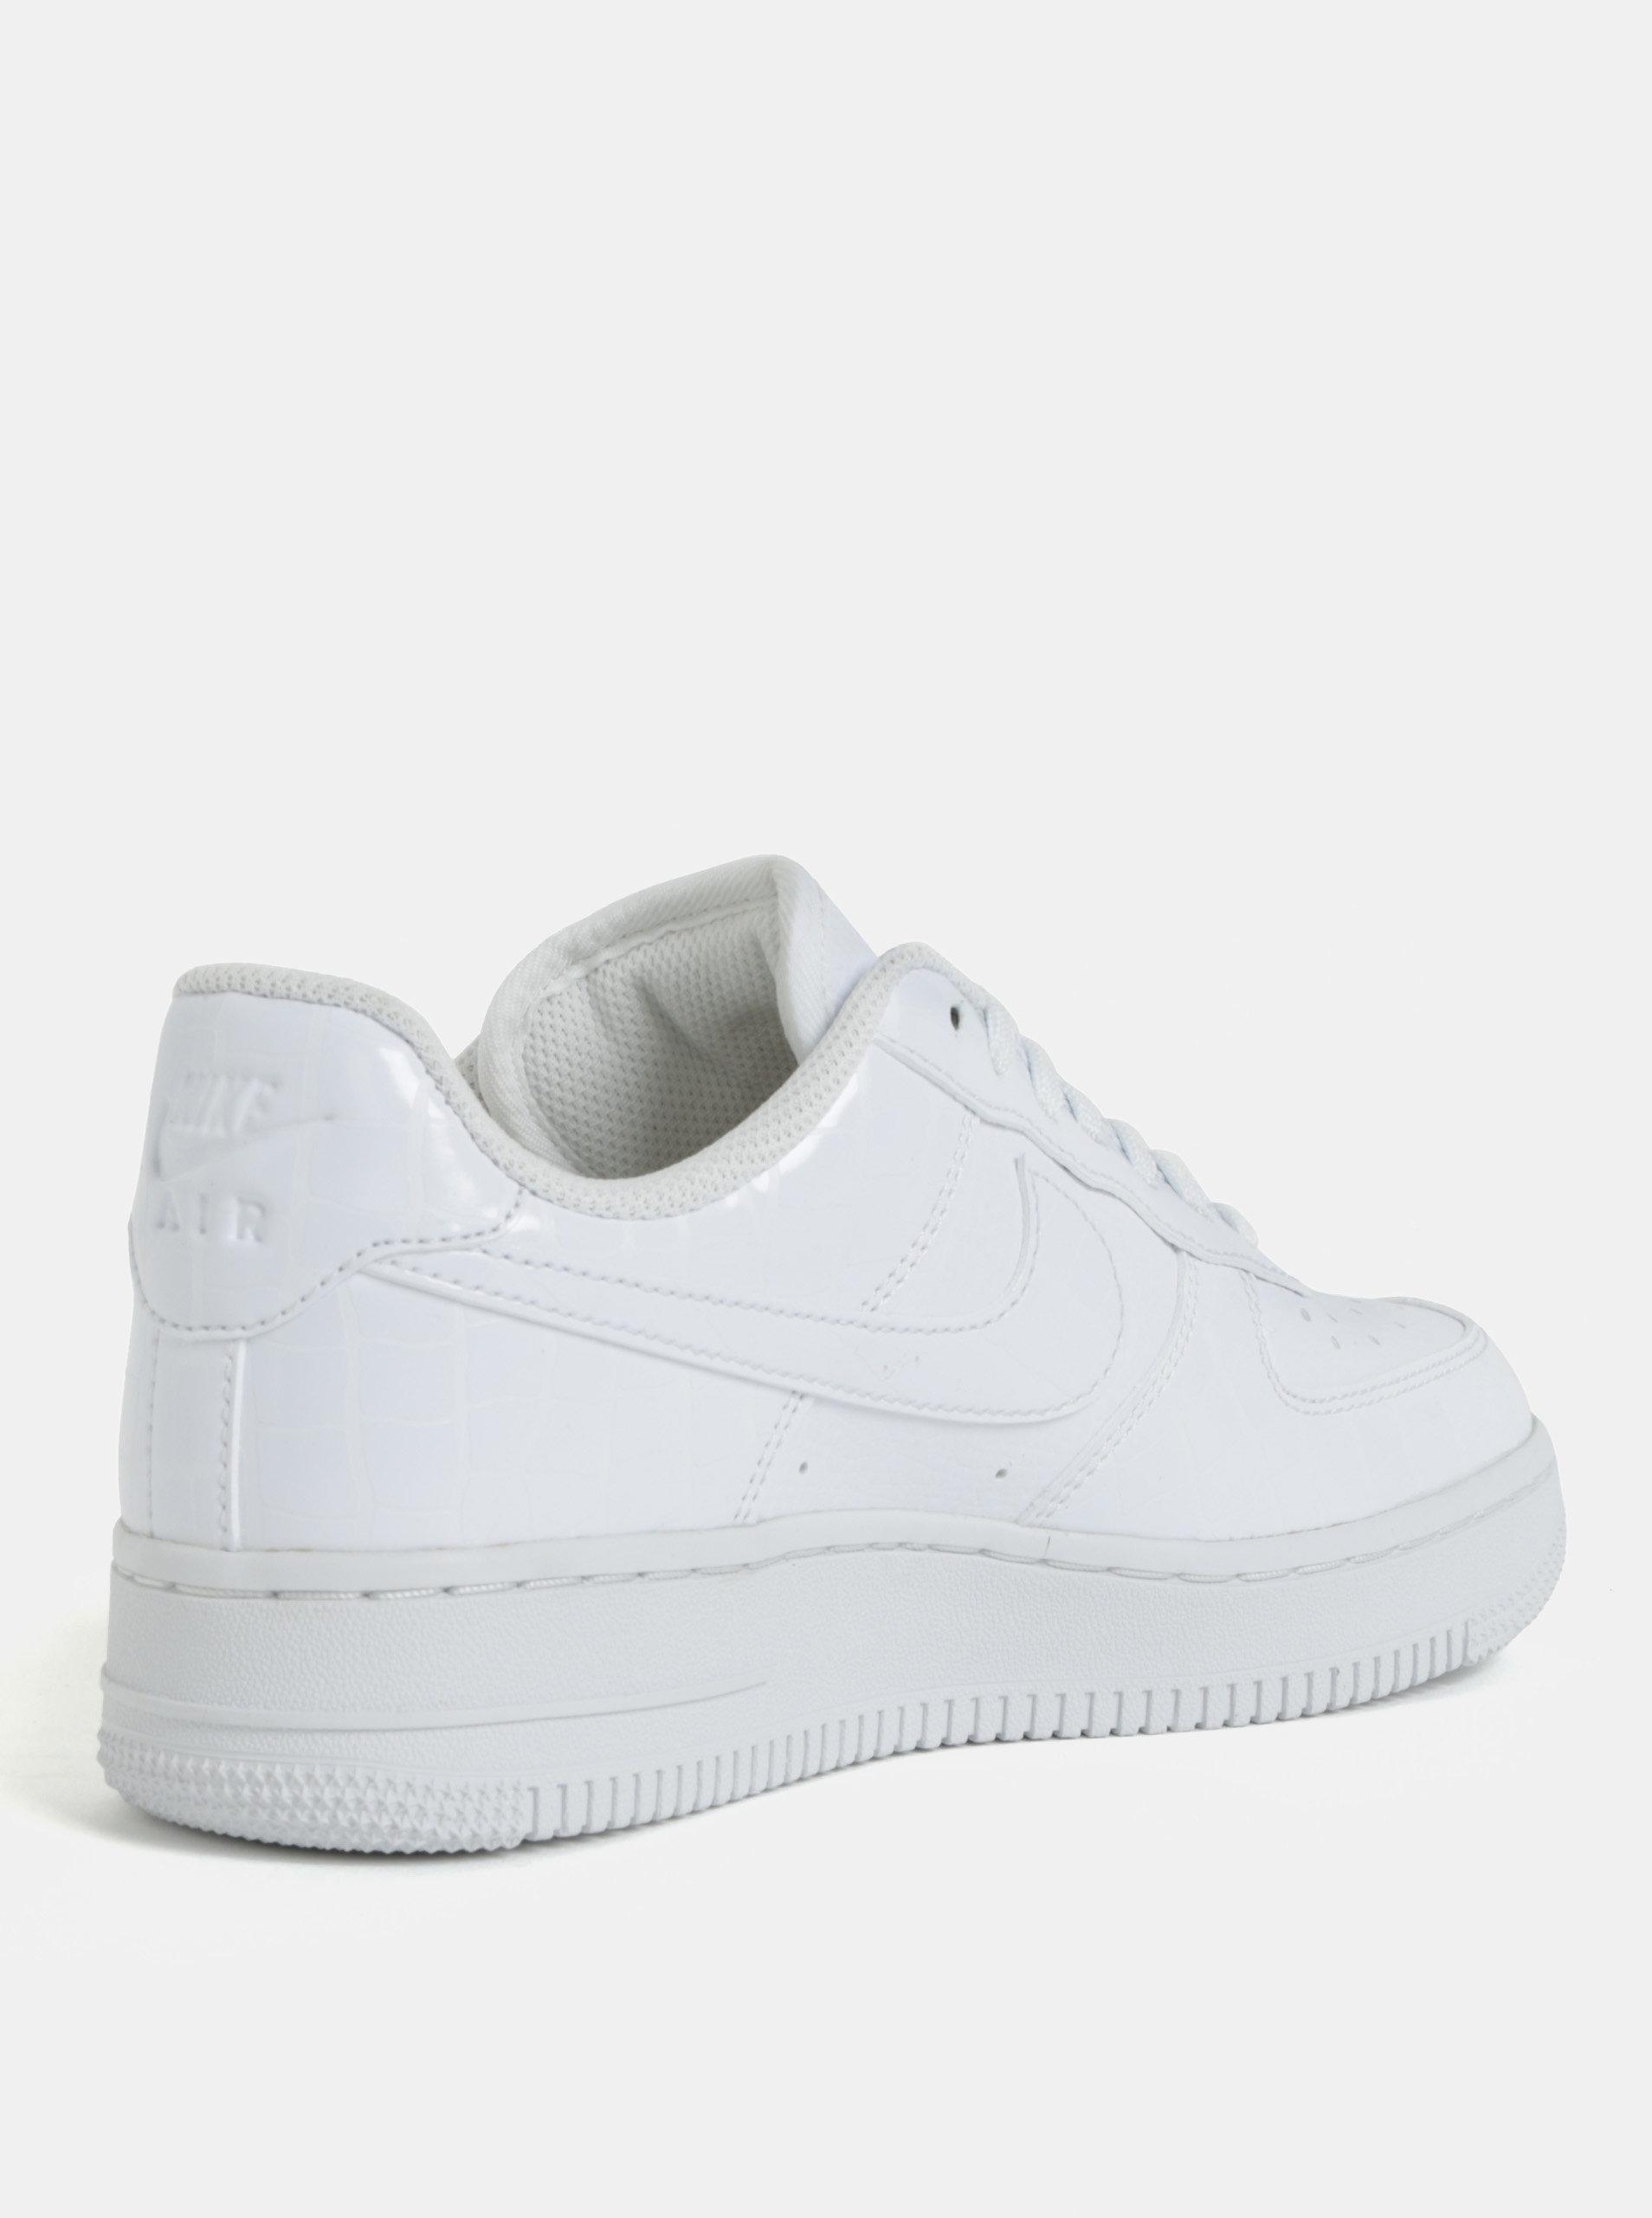 5a5c8c58fbe Bílé dámské tenisky na platformě Nike Air Force1 ...